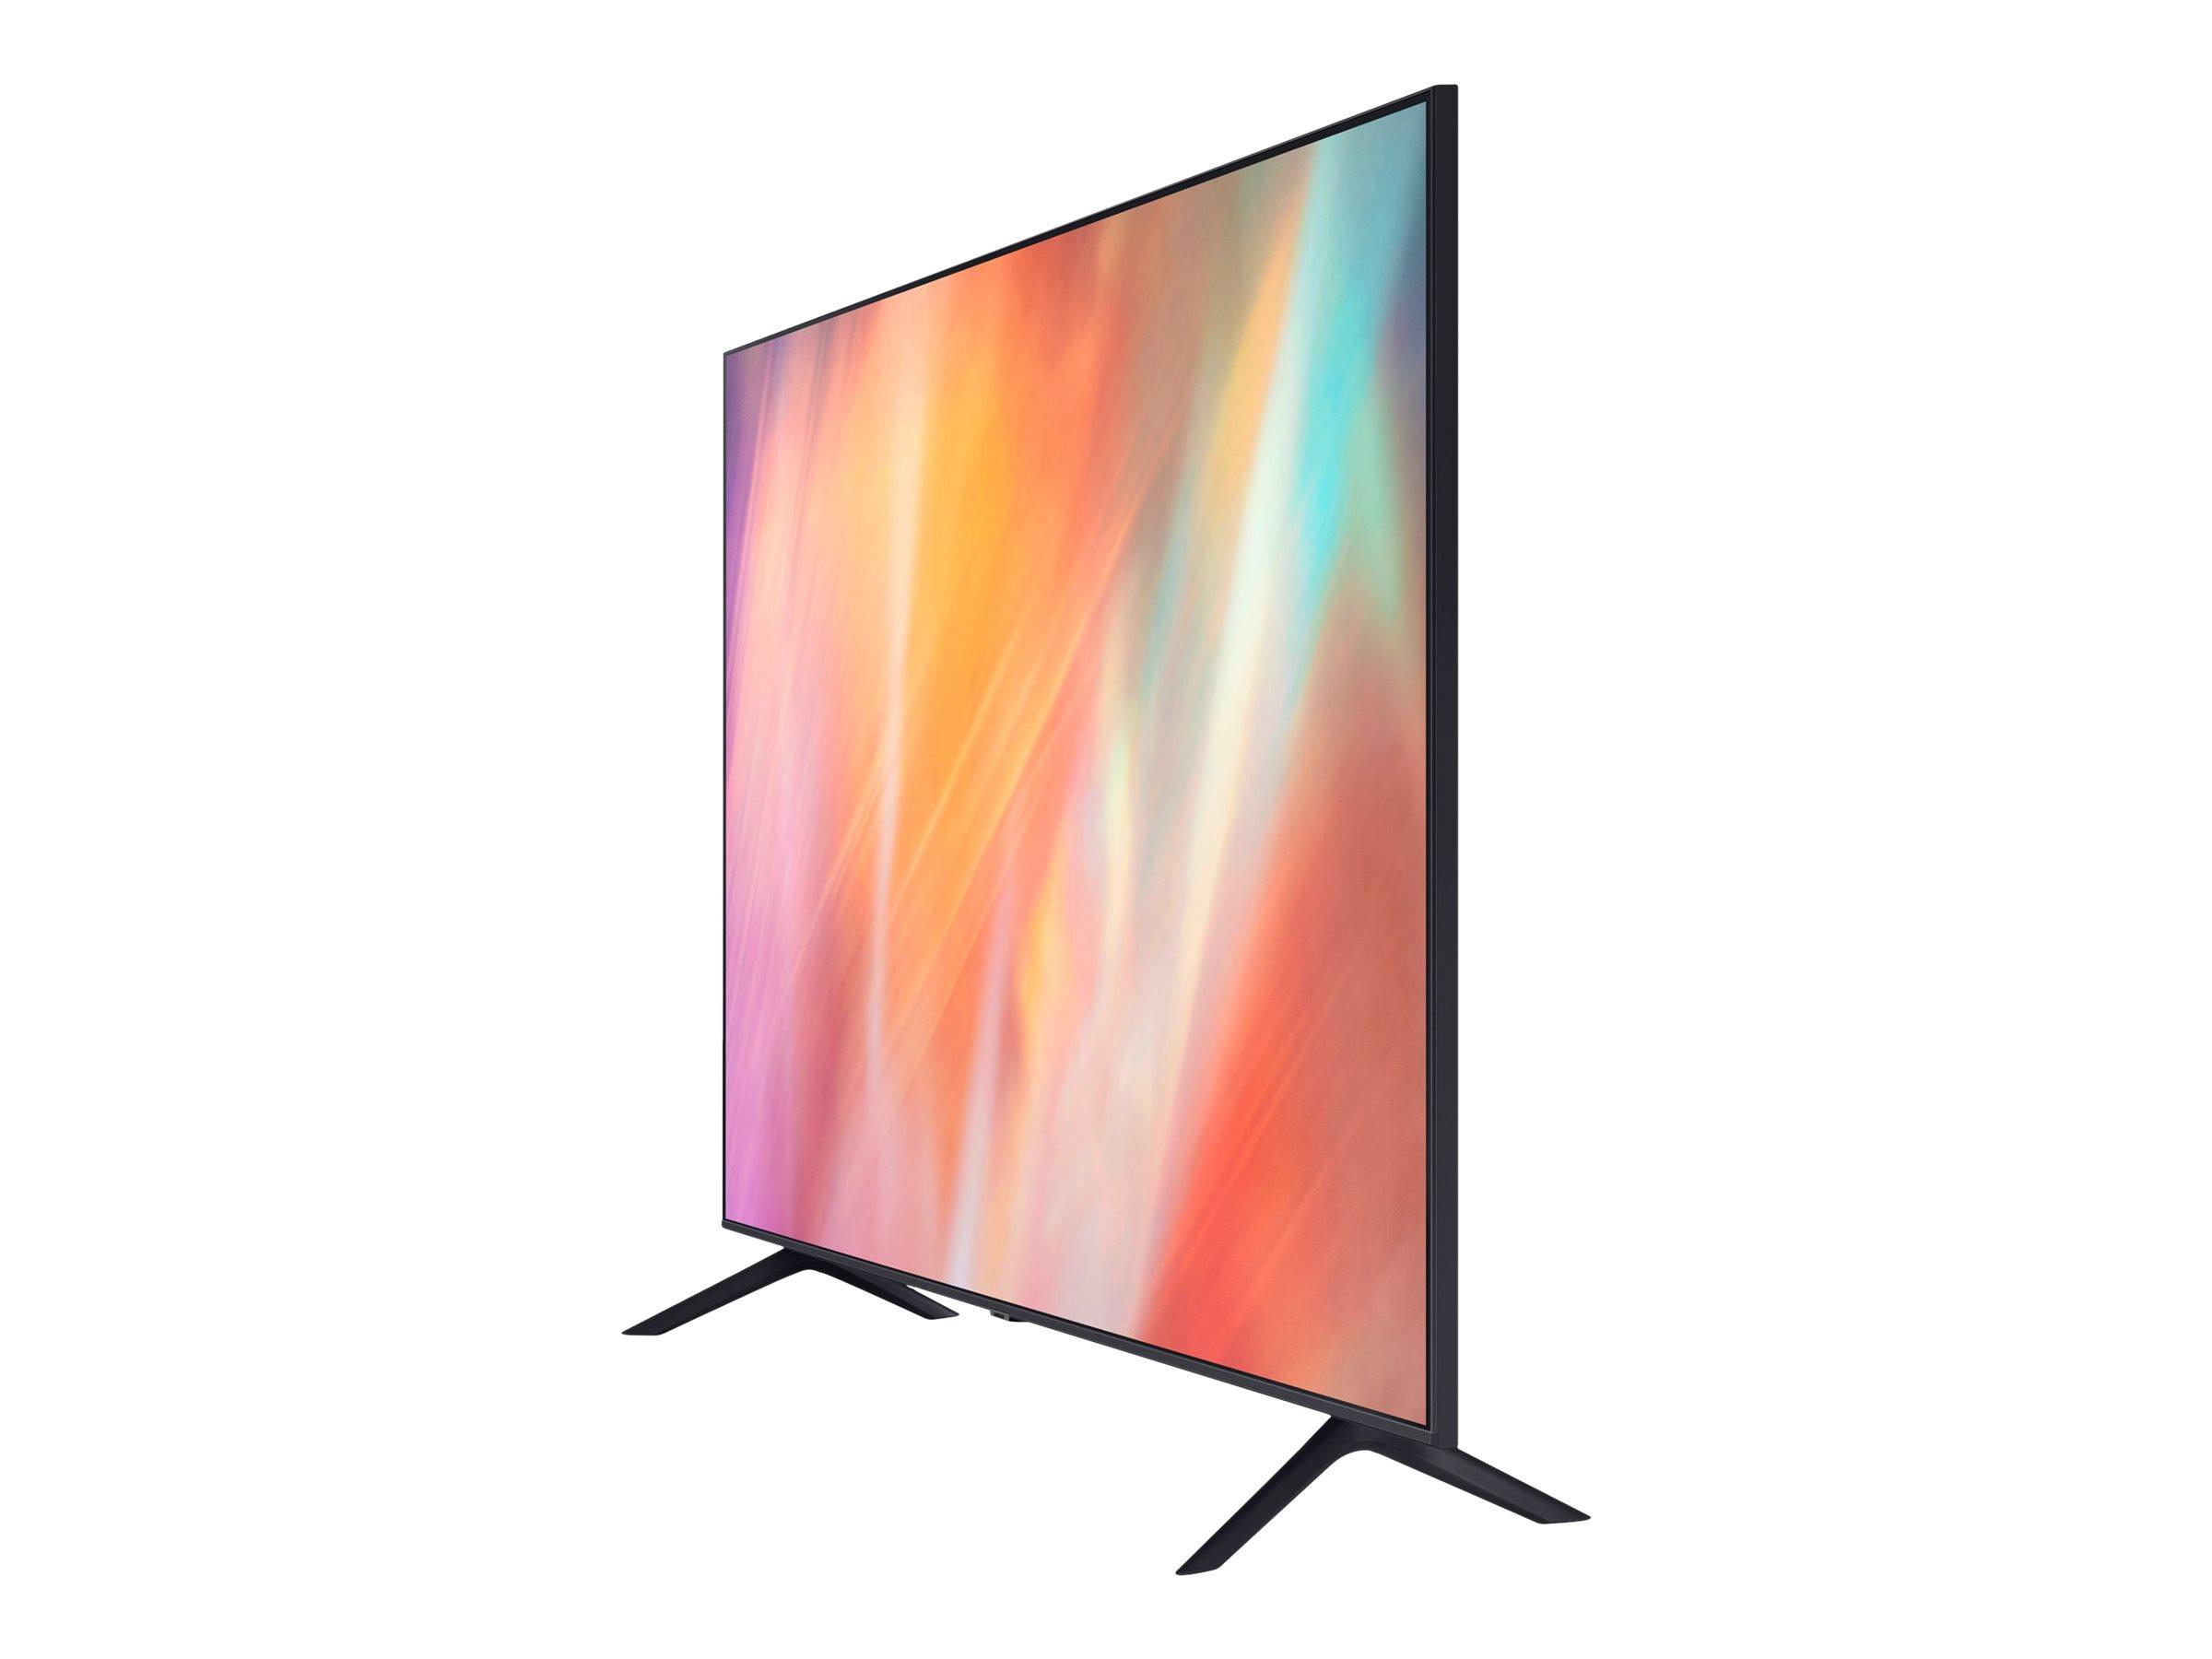 "Samsung BE50A-H - 125.7 cm (50"") Diagonalklasse BEA-H Series LCD-TV mit LED-Hintergrundbeleuchtung - Digital Signage - Smart TV - Tizen OS - 4K UHD (2160p)"